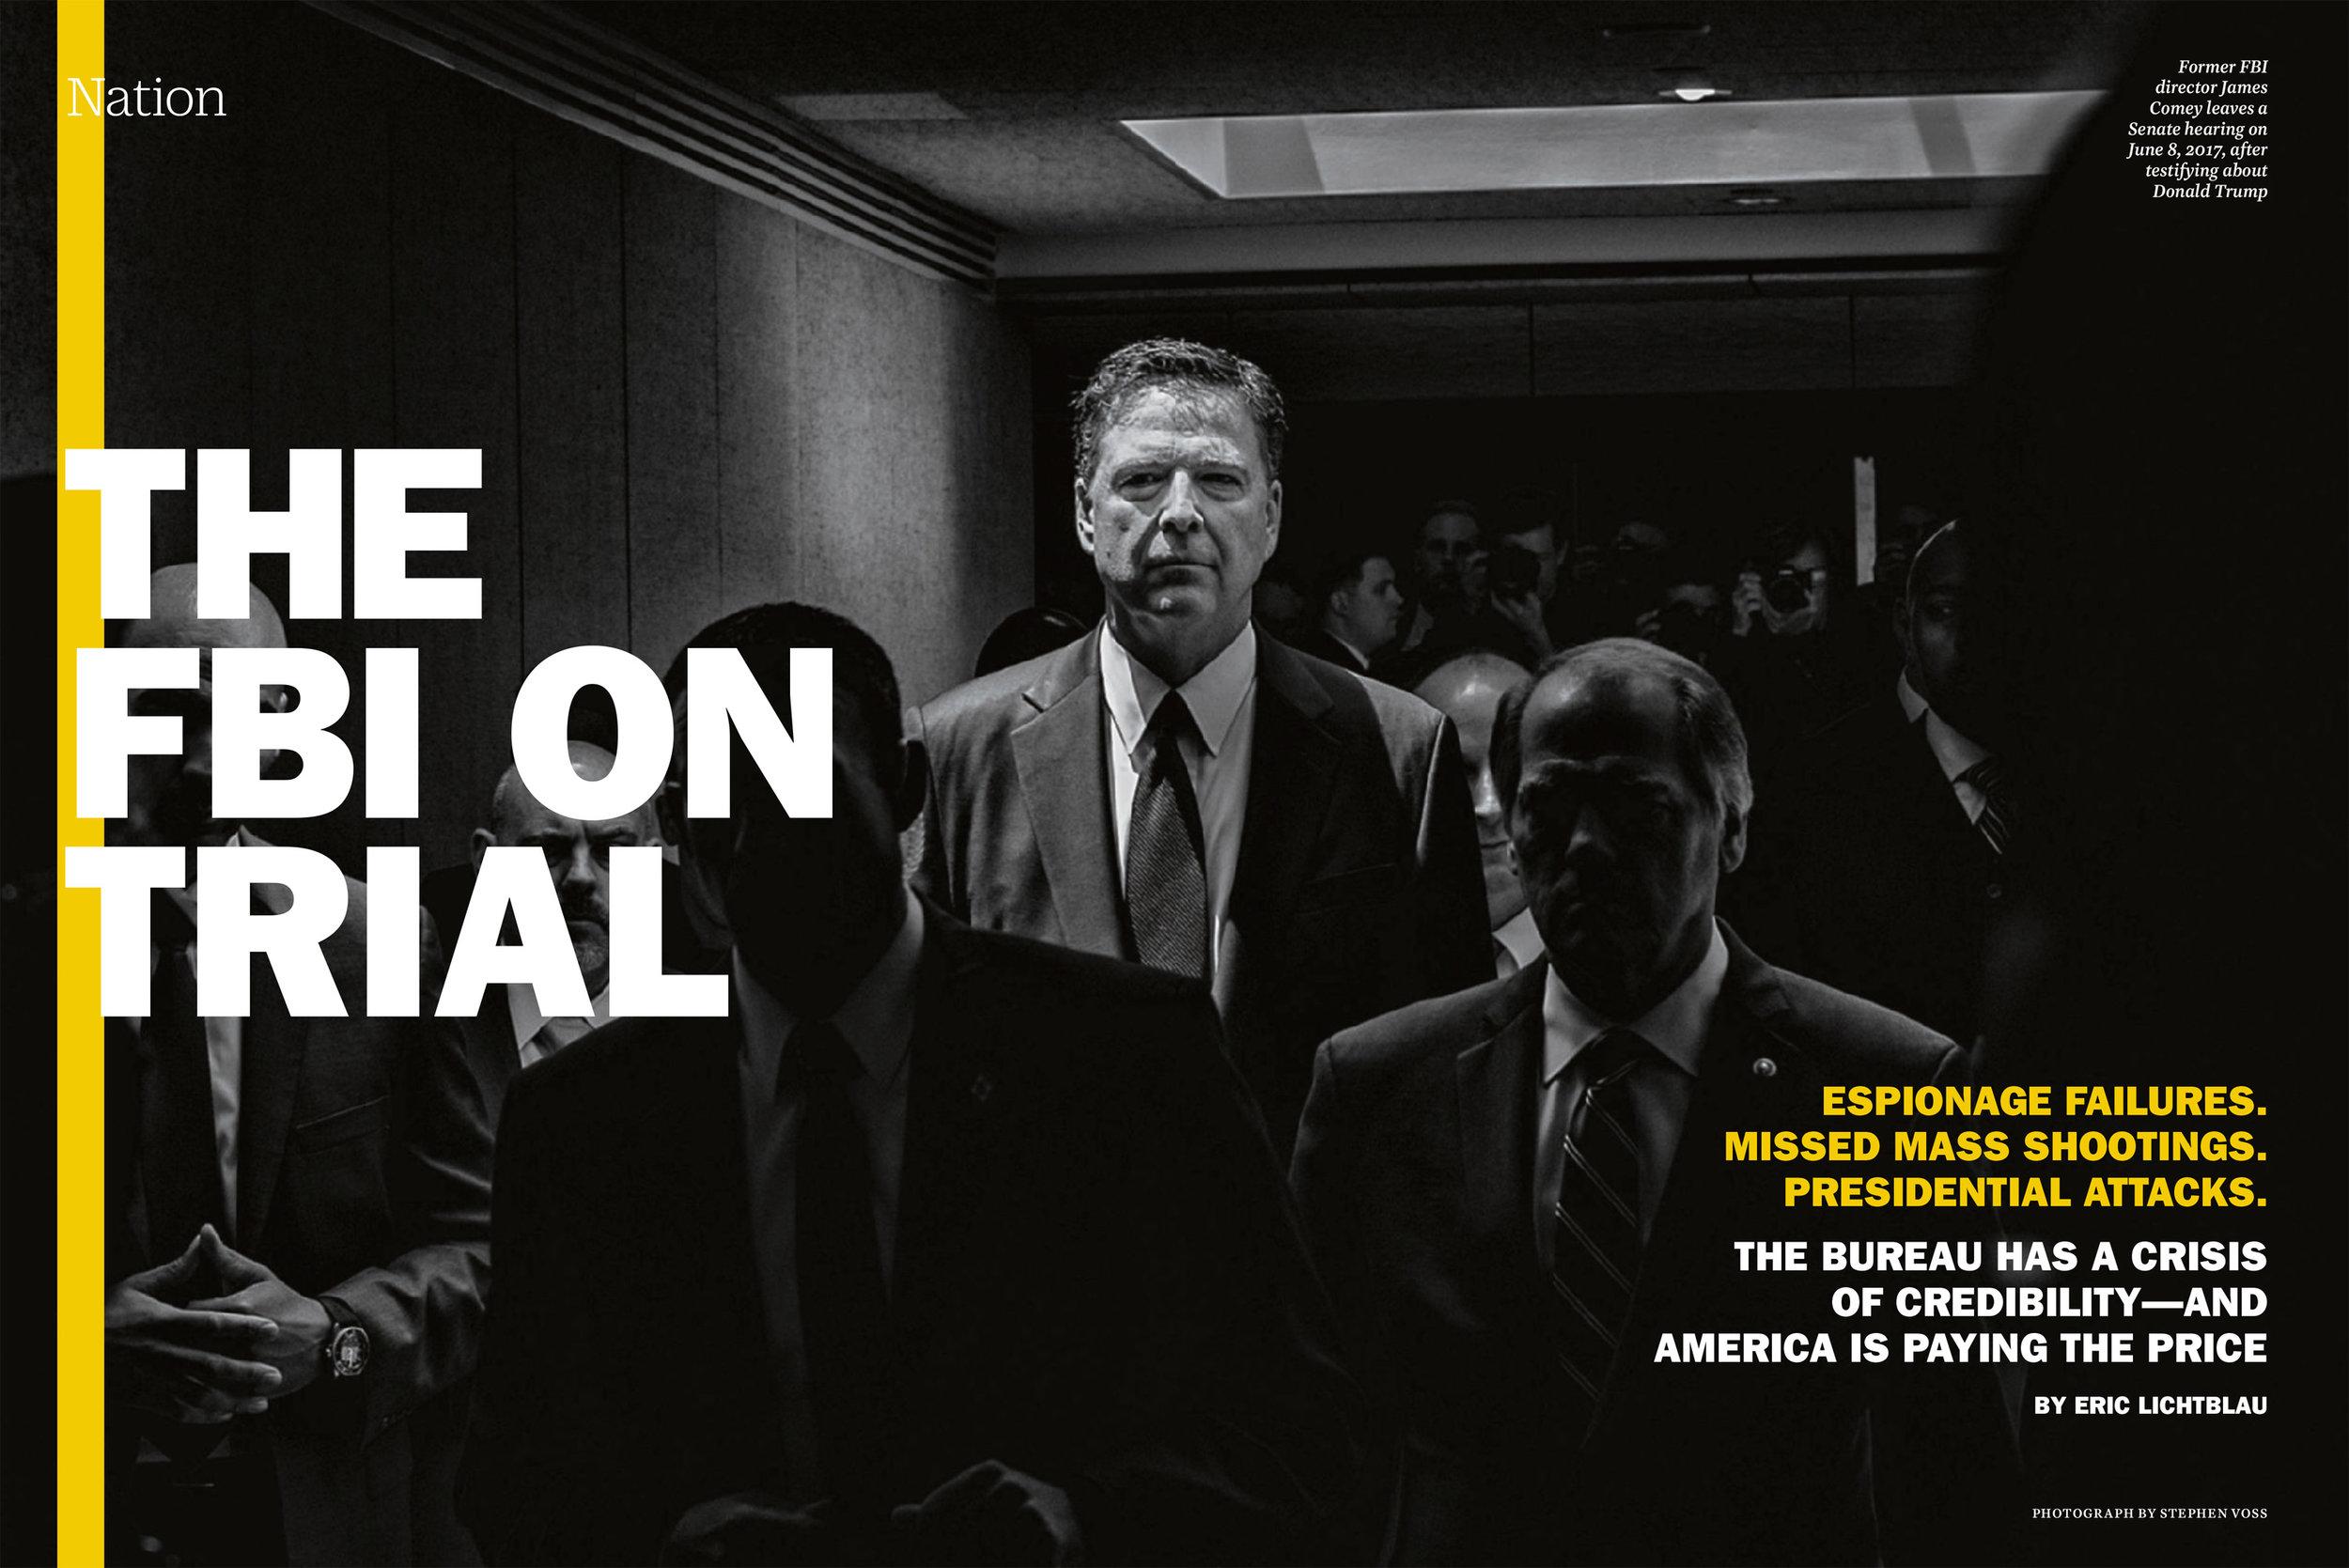 Former FBI director James Comey in TIME